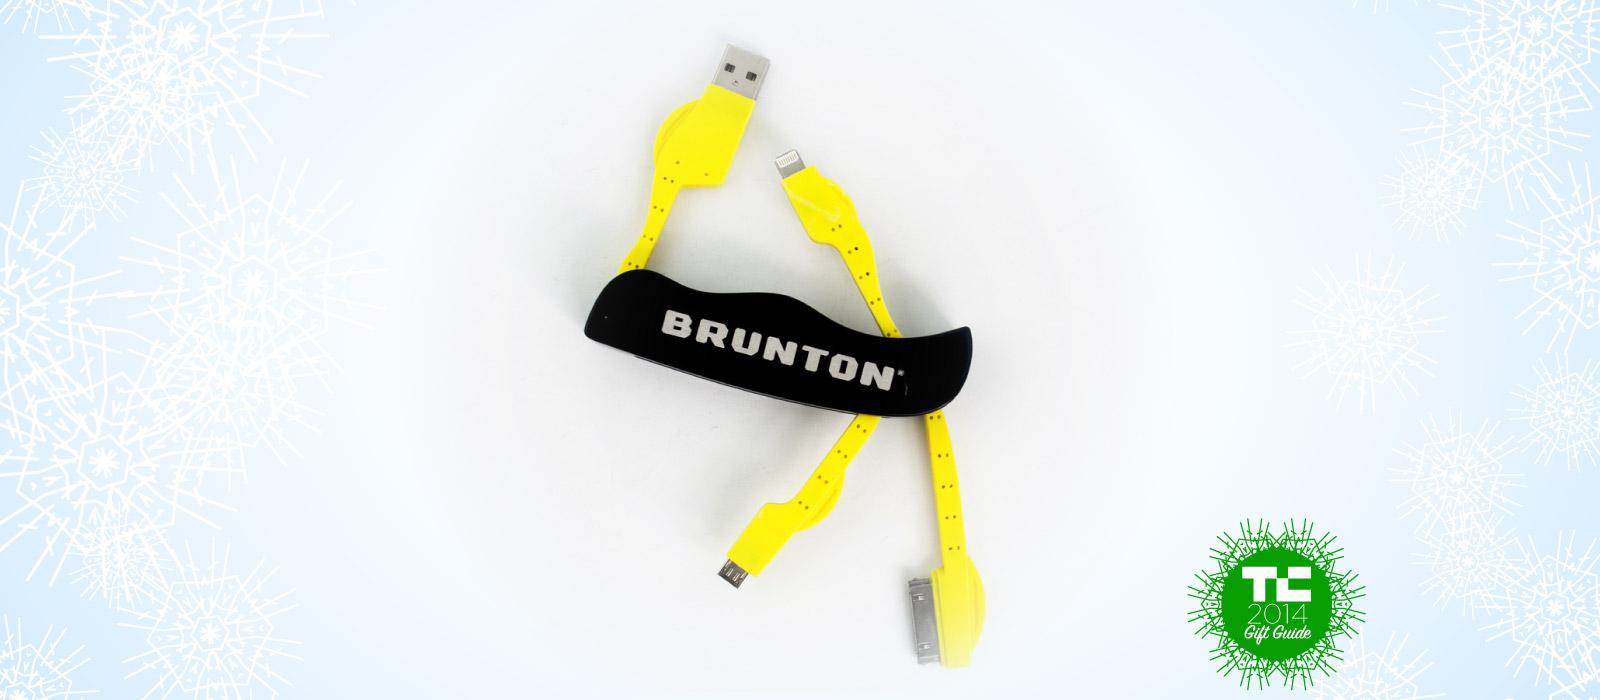 brunton-giftguide14